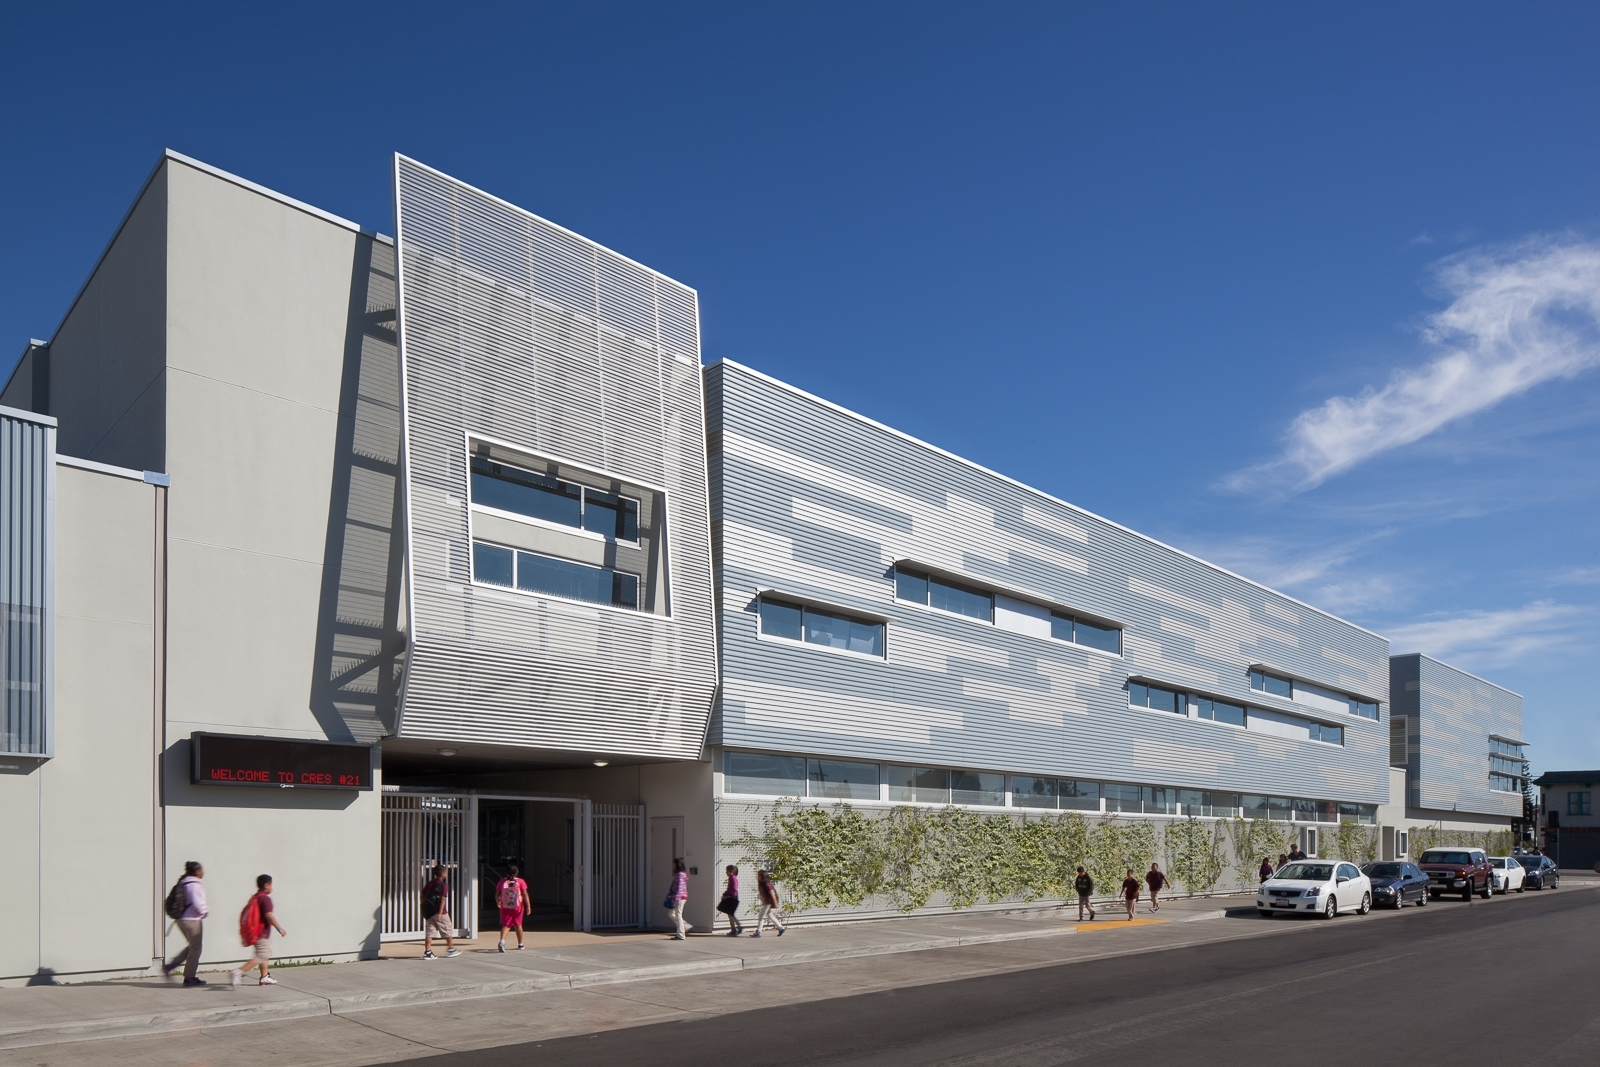 Sally Ride Elementary School